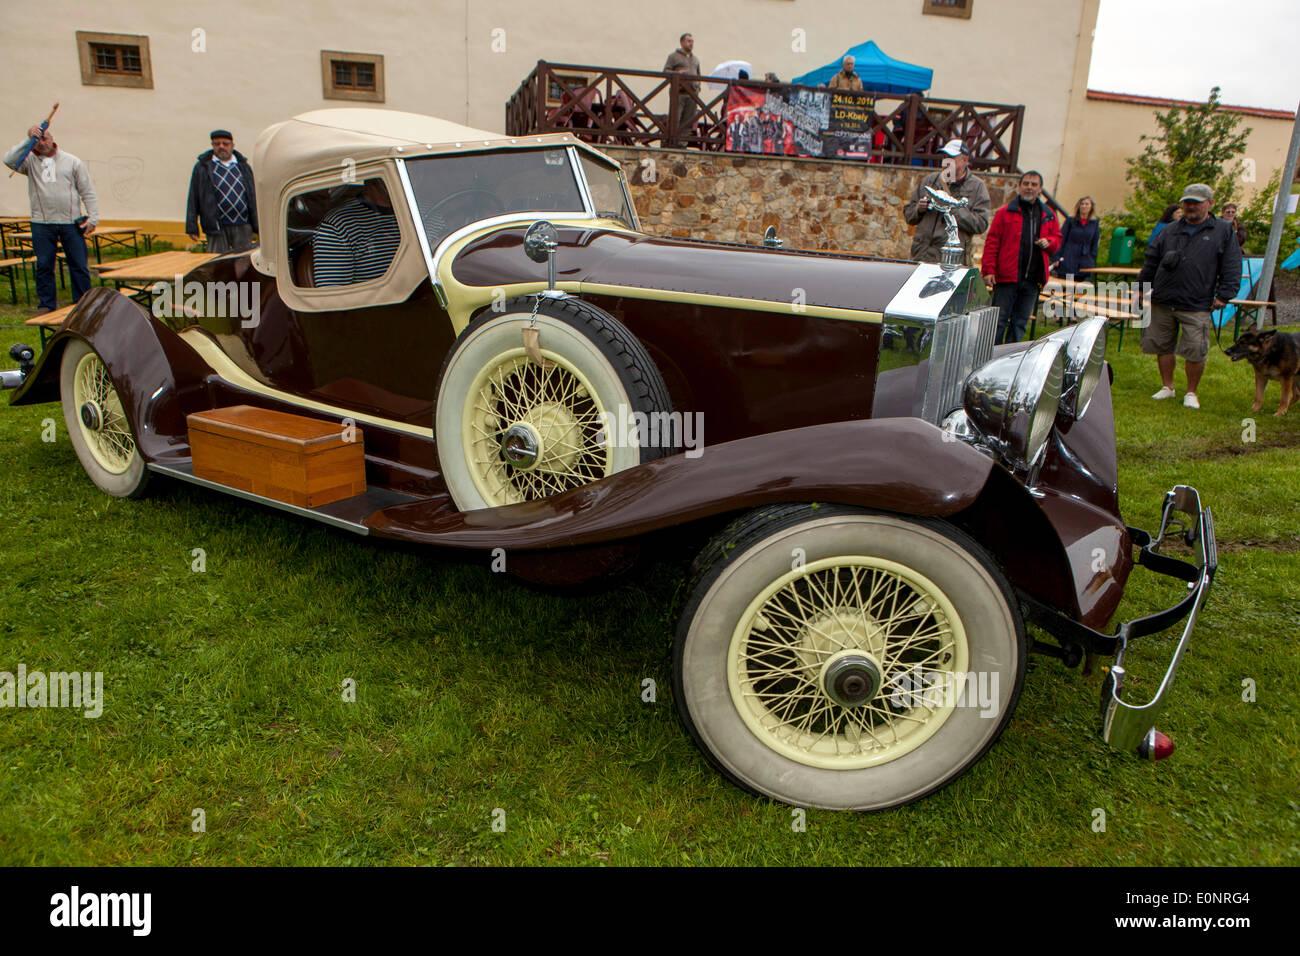 Rolls Royce Silver Ghost roadster, Oldtimer, Tschechische Republik Stockbild